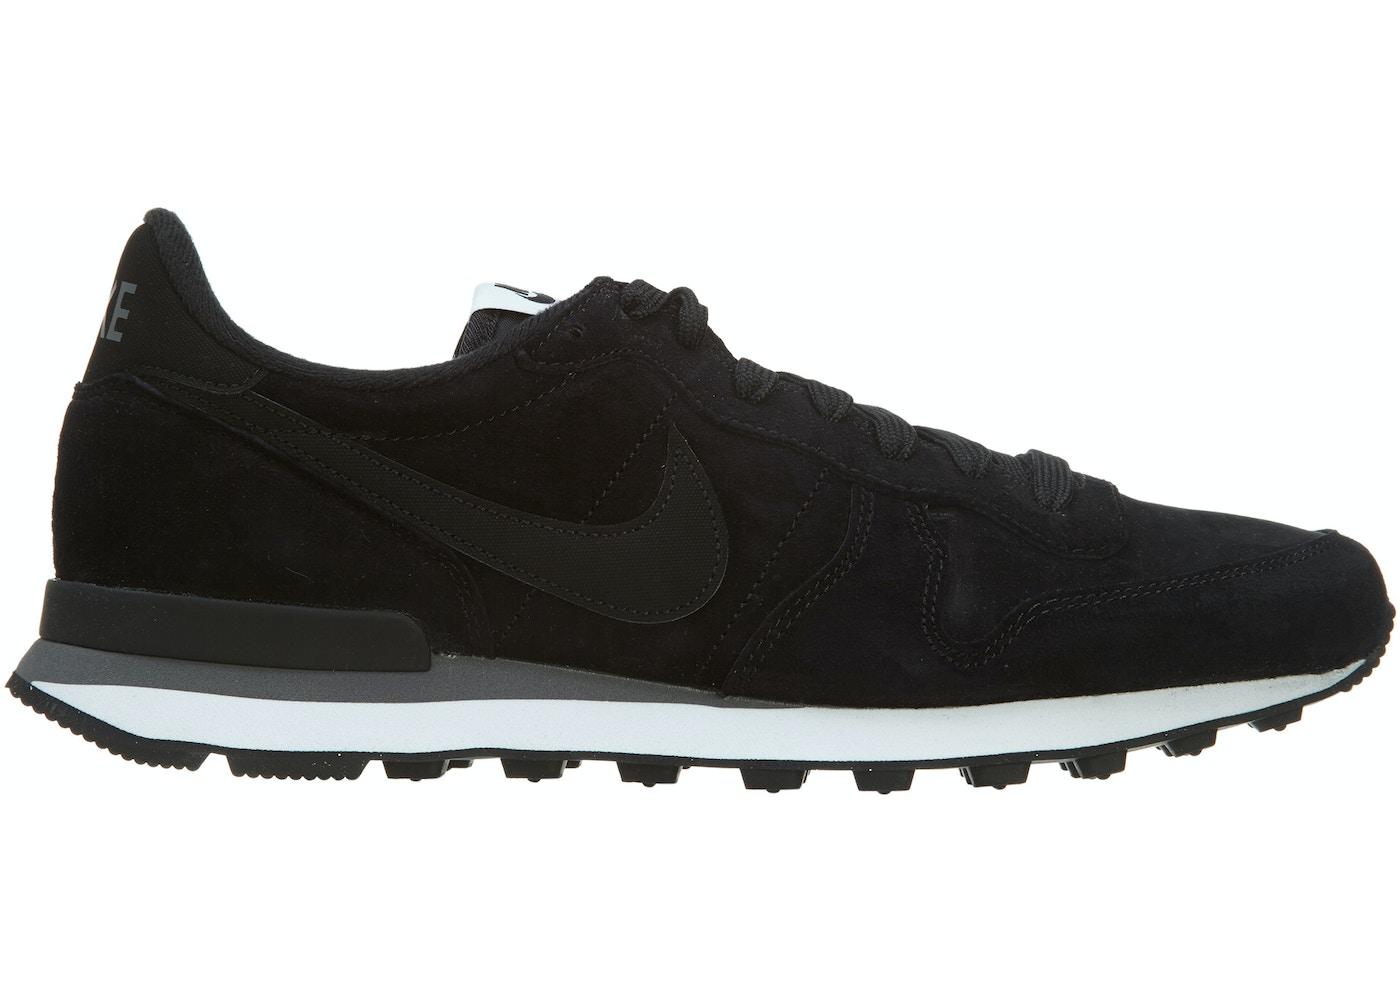 Pef abolir Fatal  Nike Internationalist Leather Black Black-Dark Grey-White - 631755-010